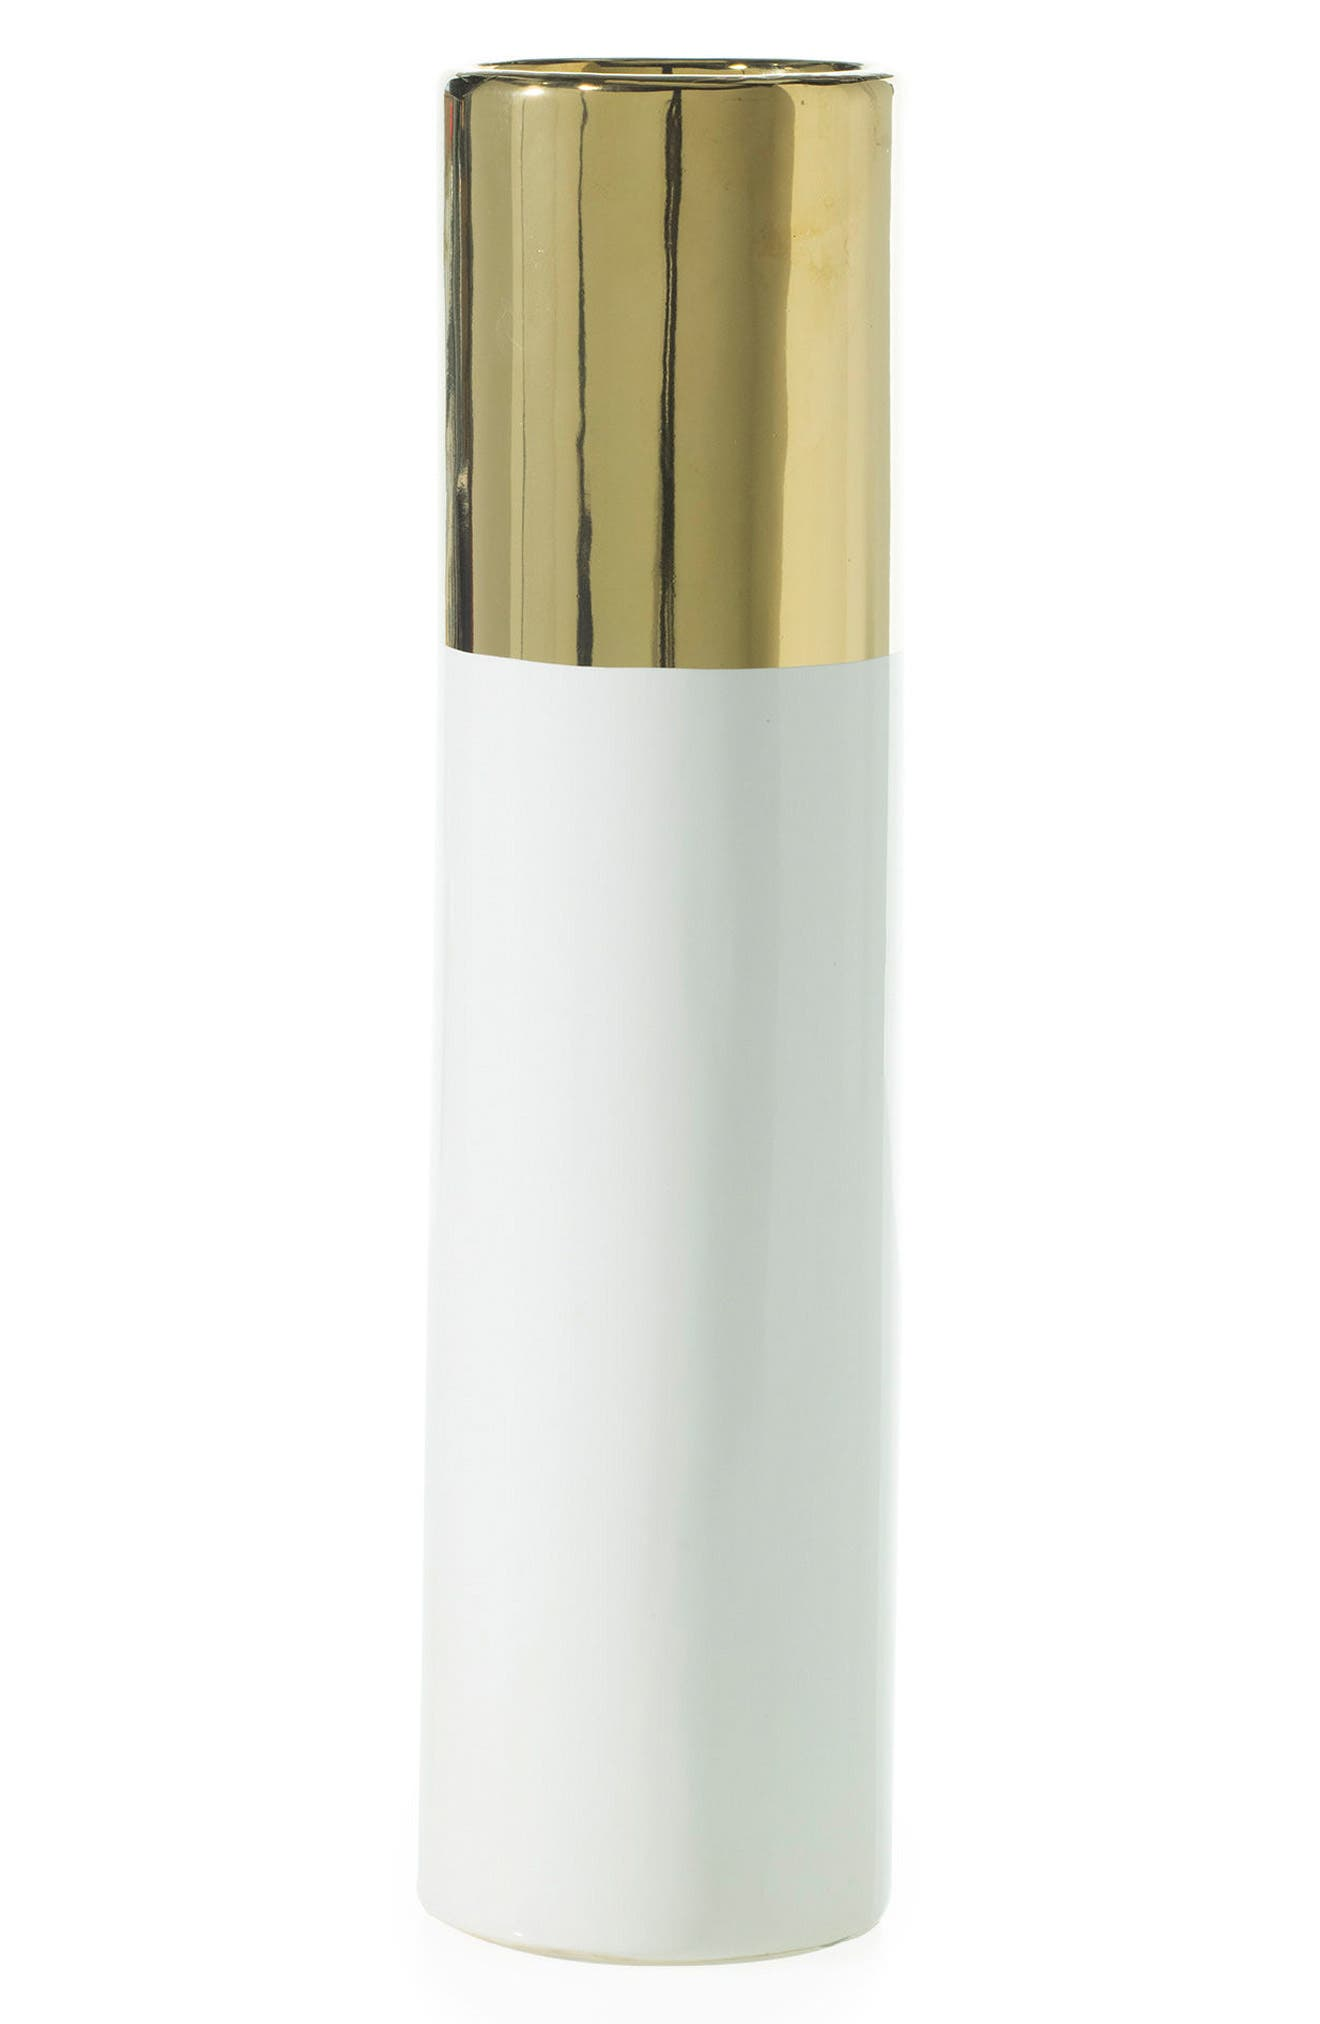 Alternate Image 1 Selected - Accent Decor Klein Vase